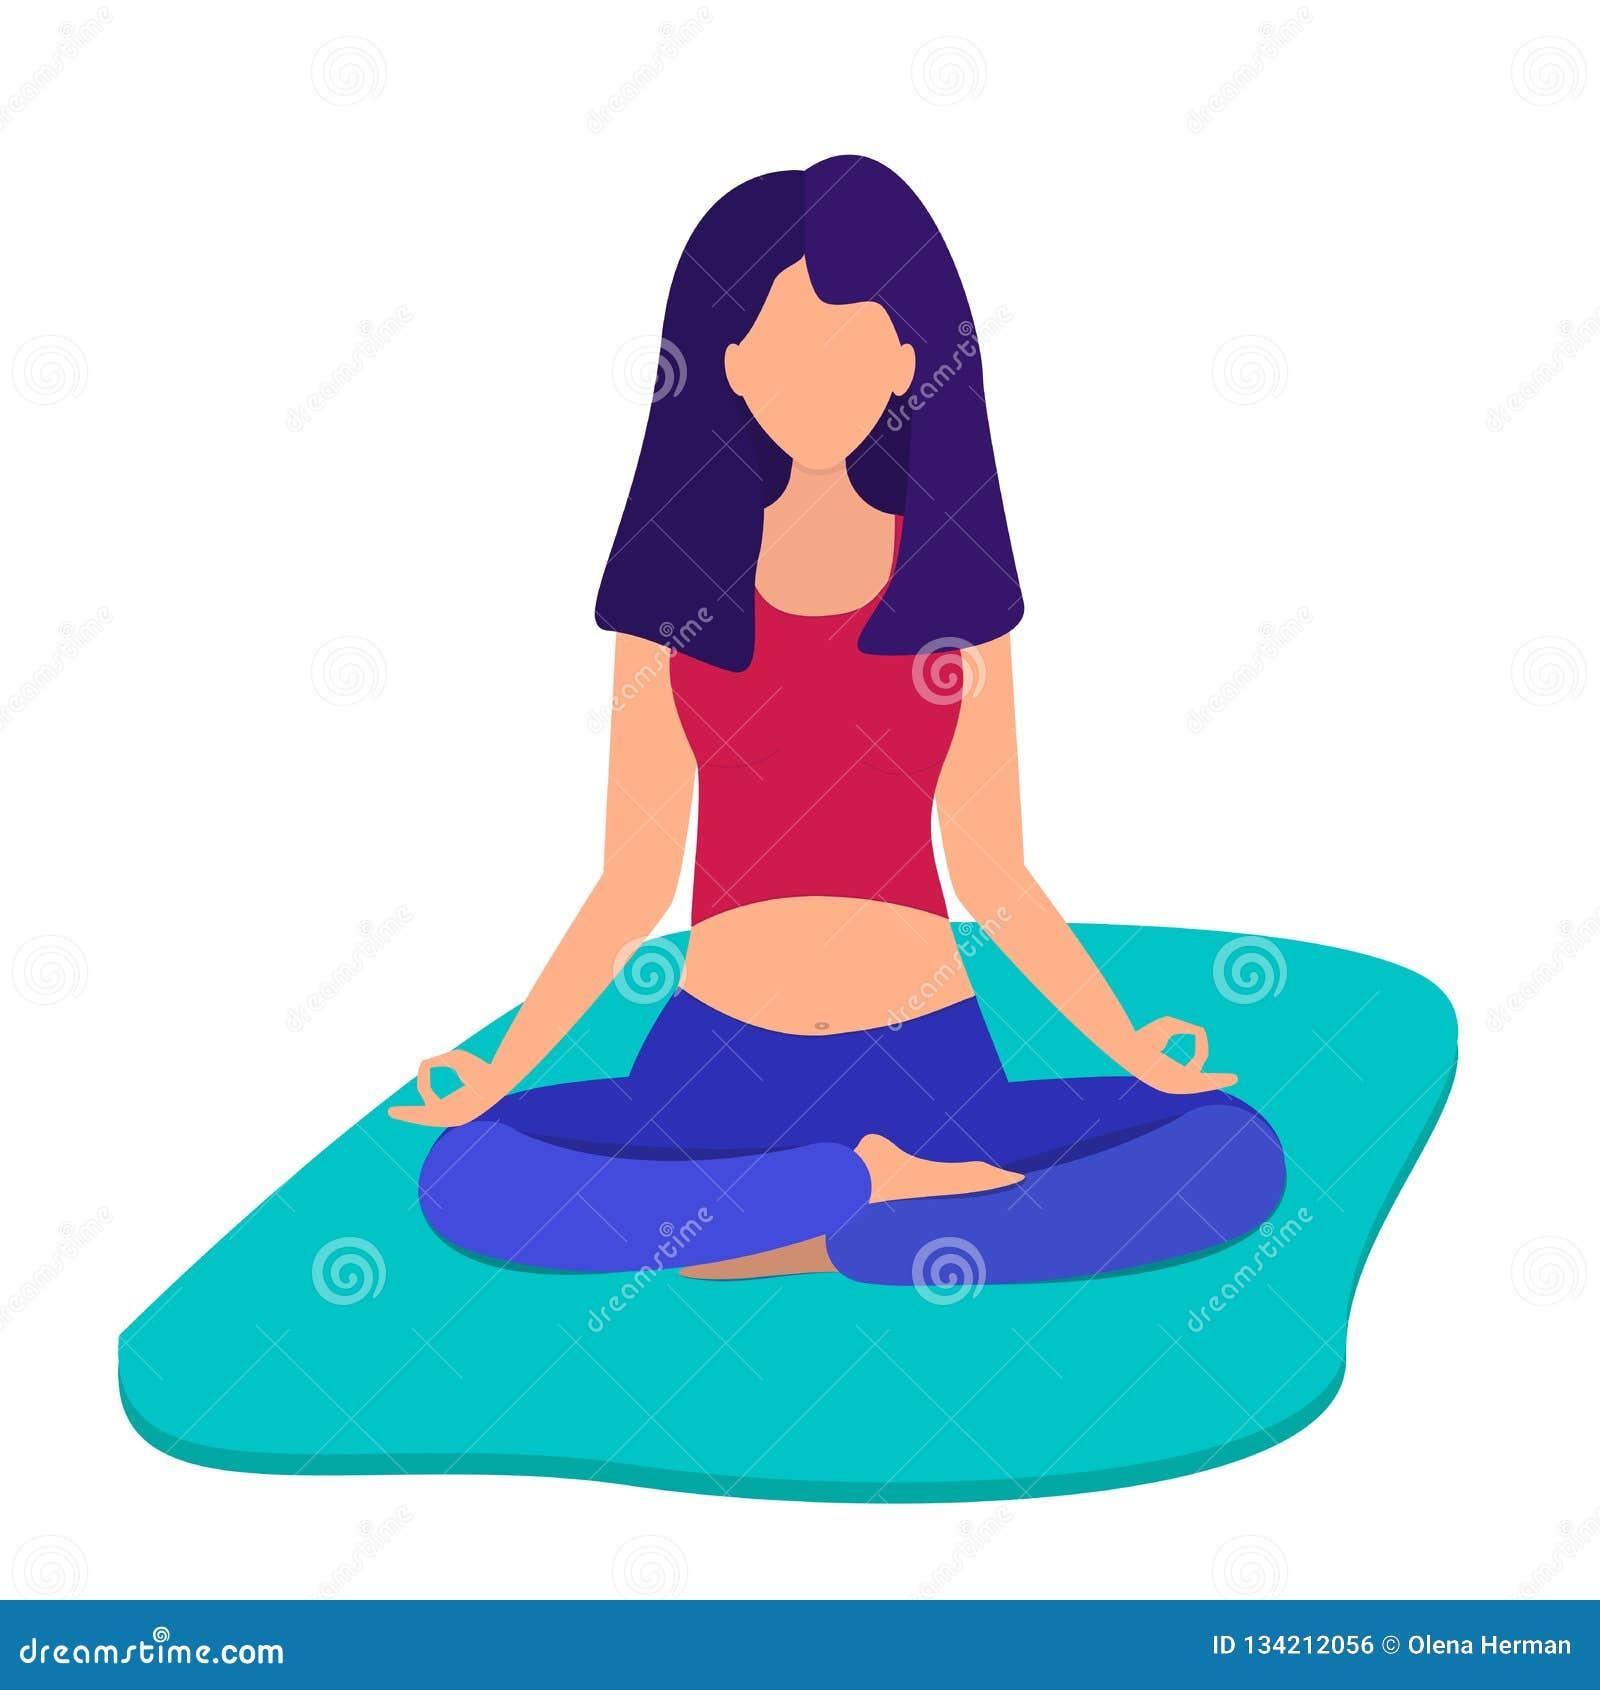 The girl meditates. Girl is doing yoga